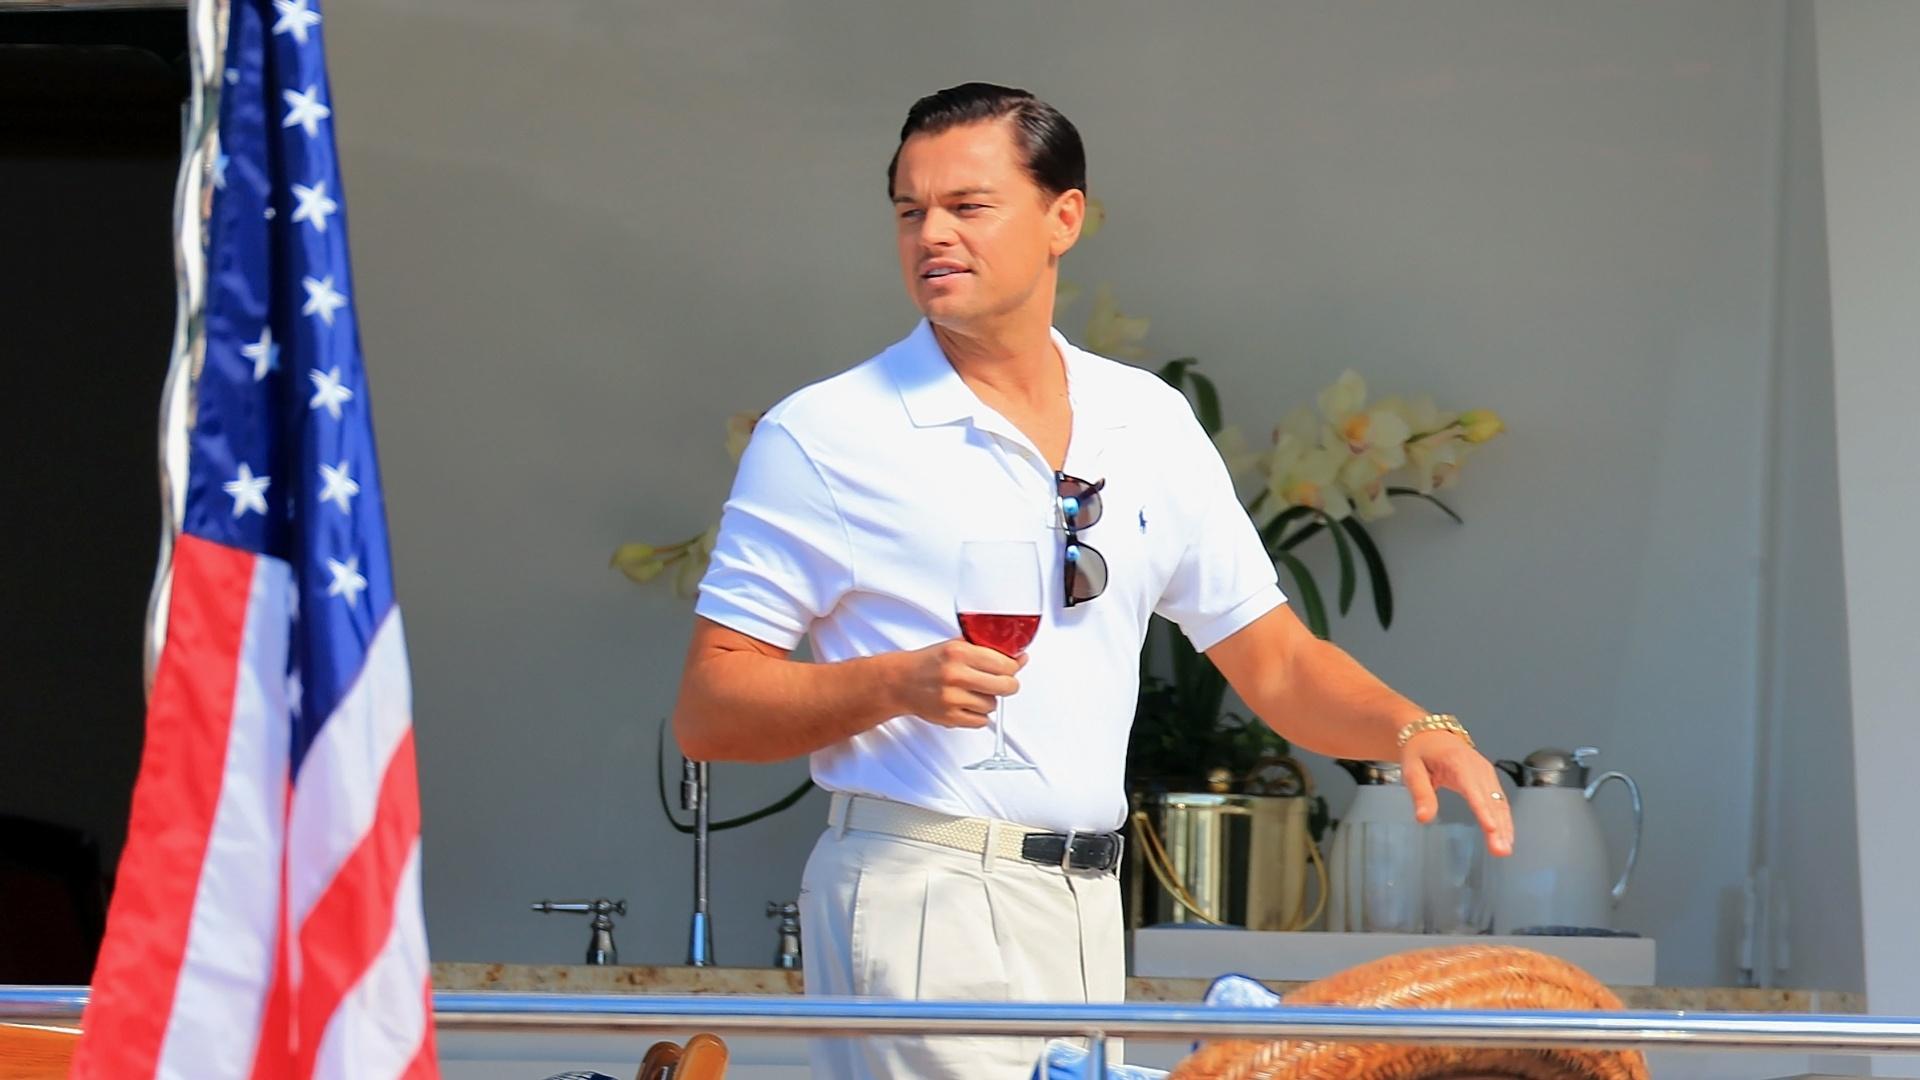 Akarsz röhögni? Ez Leonardo DiCaprio igazi neve